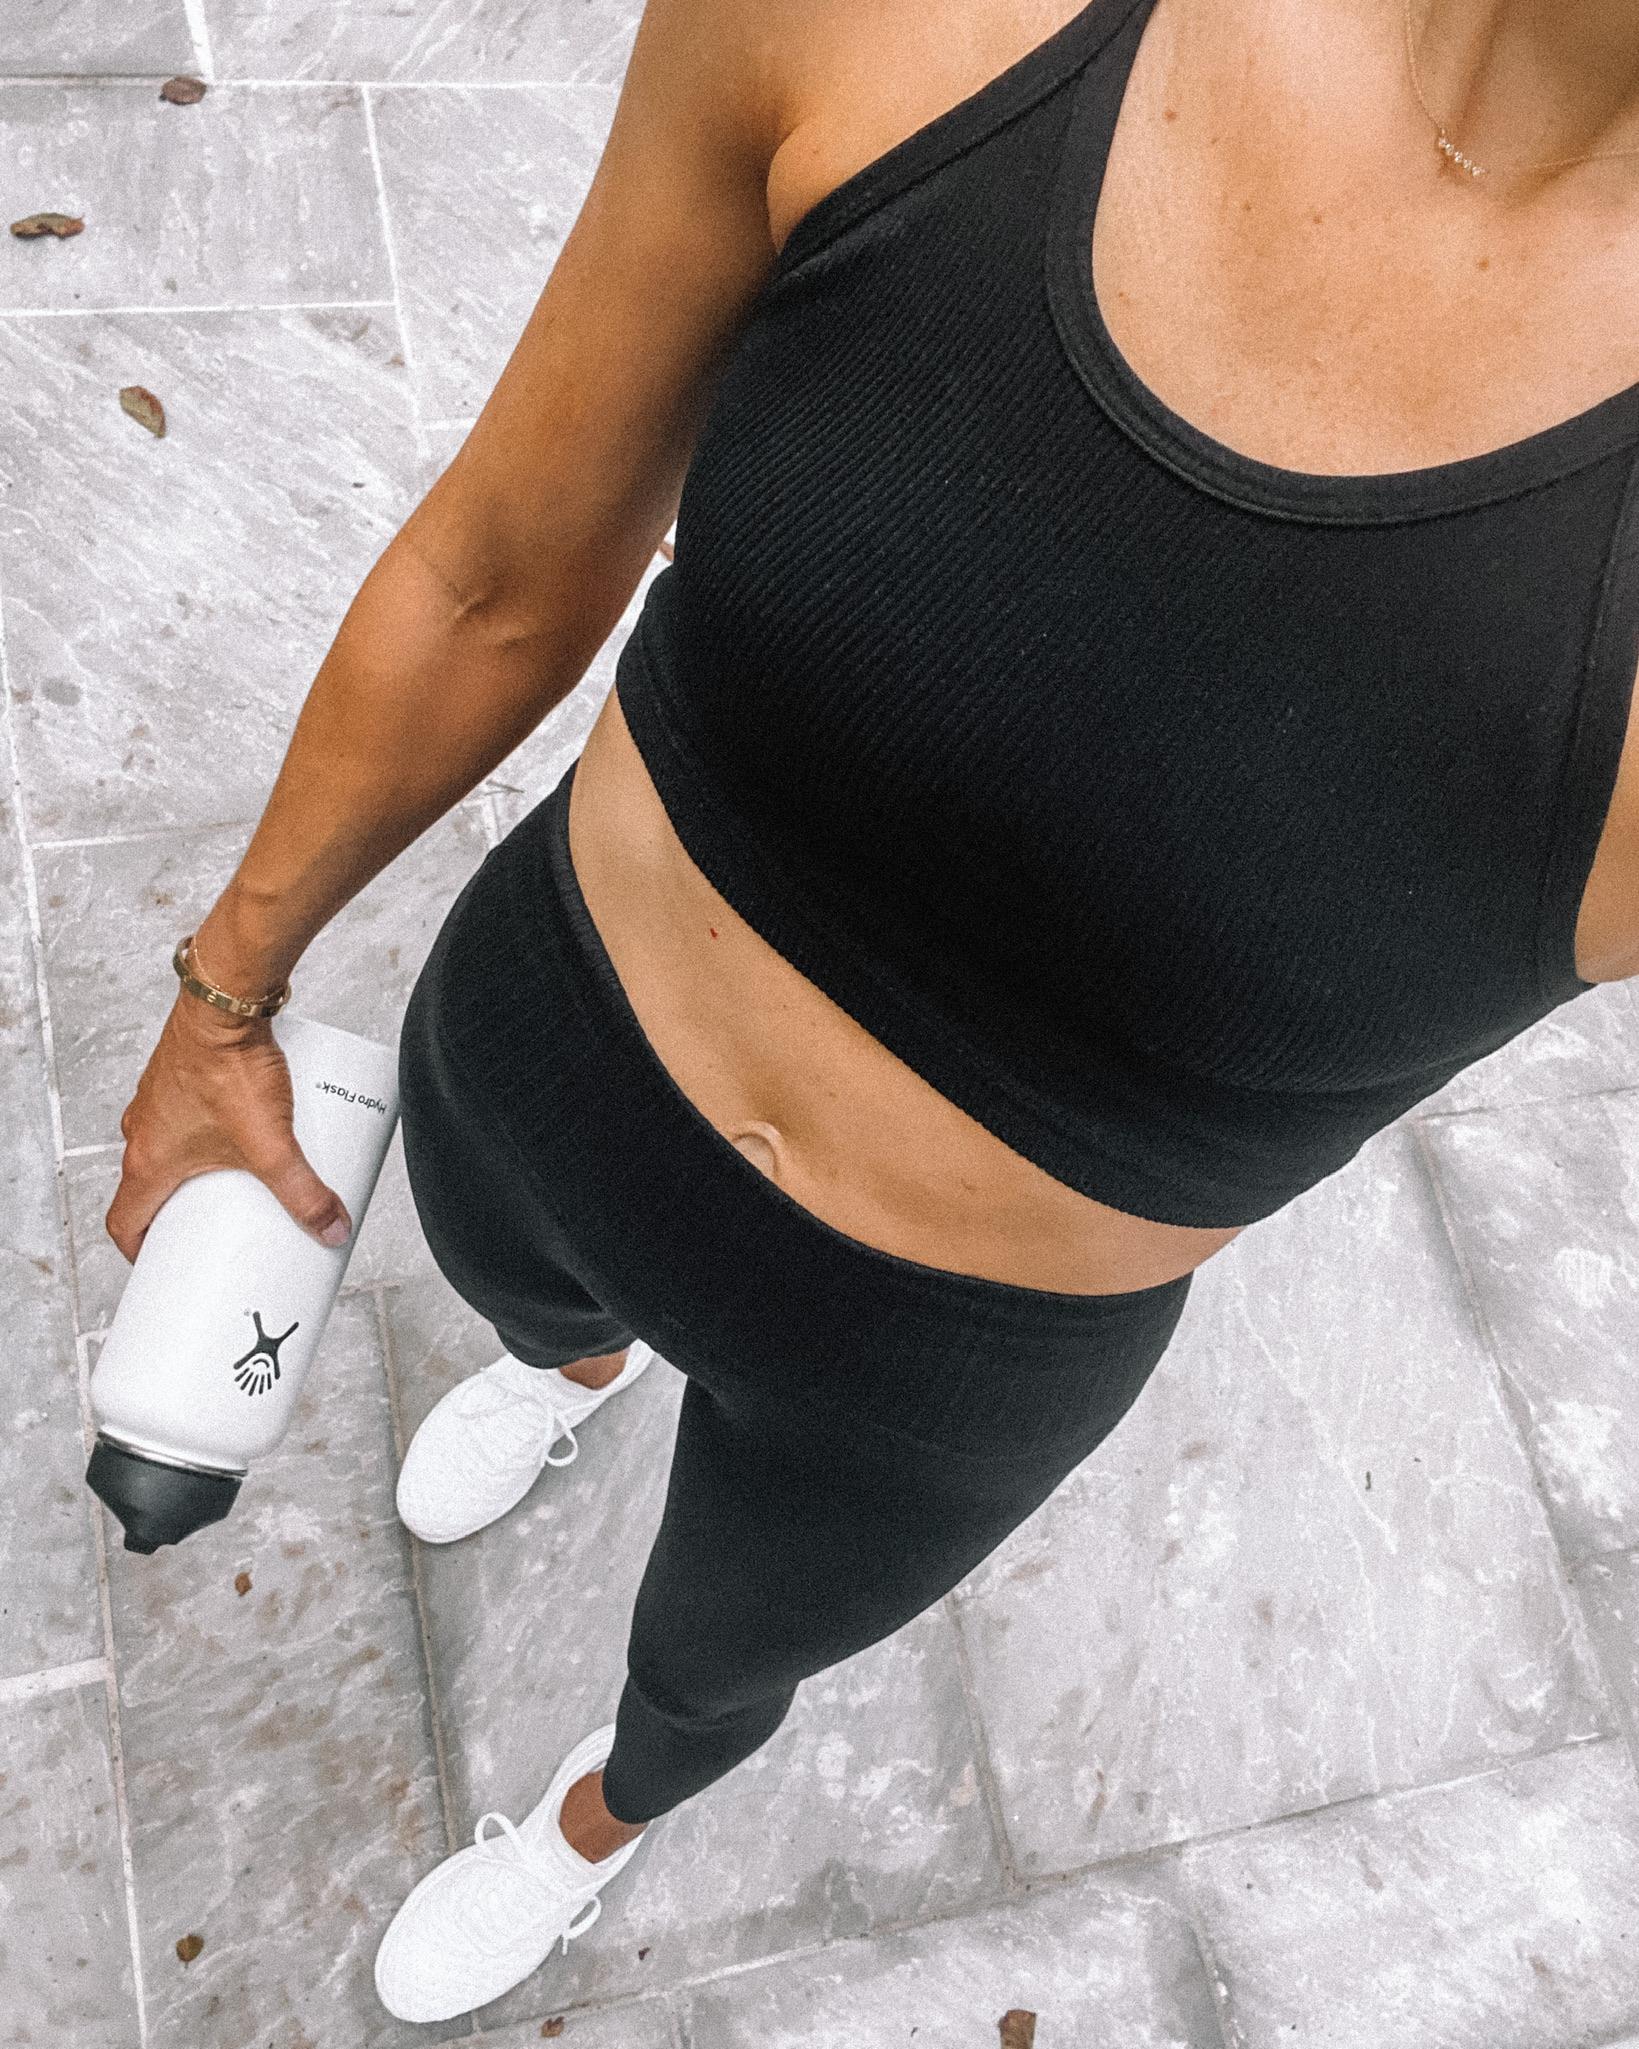 Fashion Jackson Wearing FP Movement Black Good Karma Tank Black Leggings APL Sneakers workout outfits for women